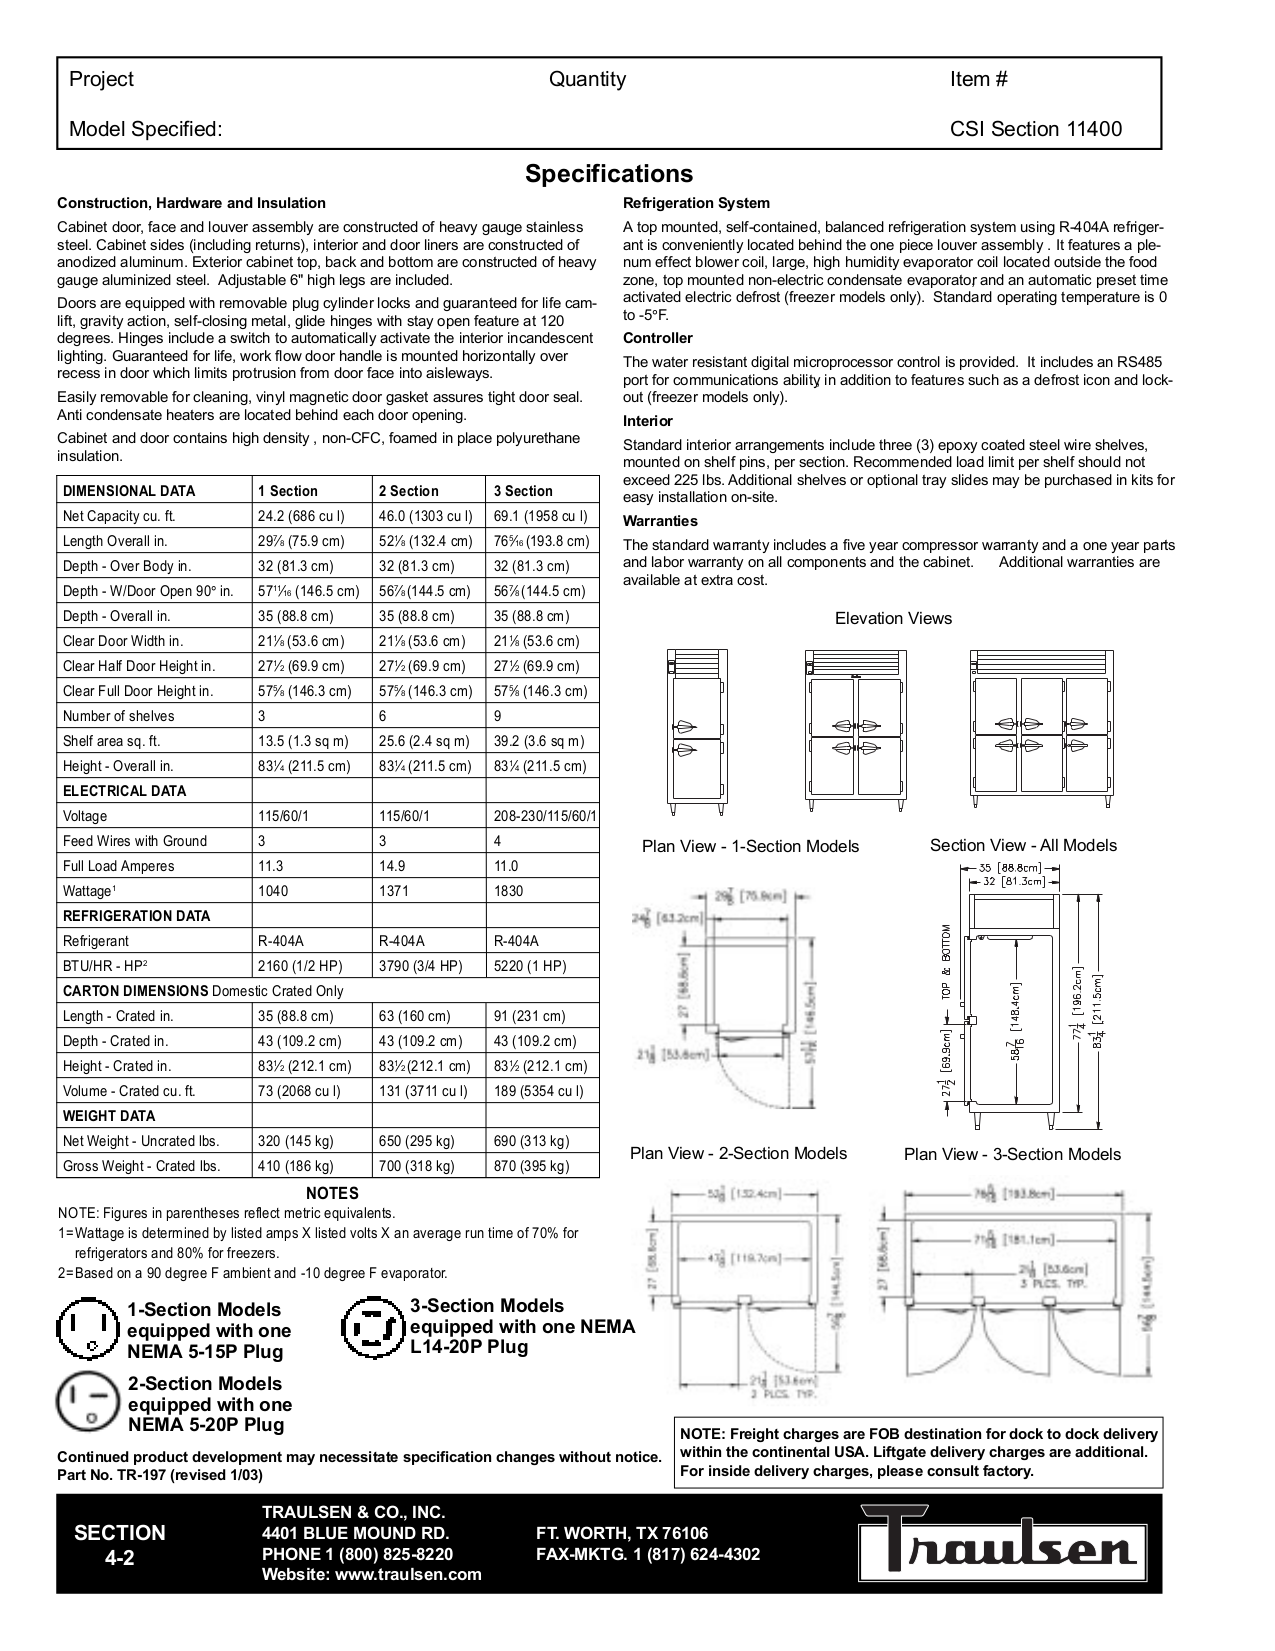 Traulsen Freezer Wiring Diagram